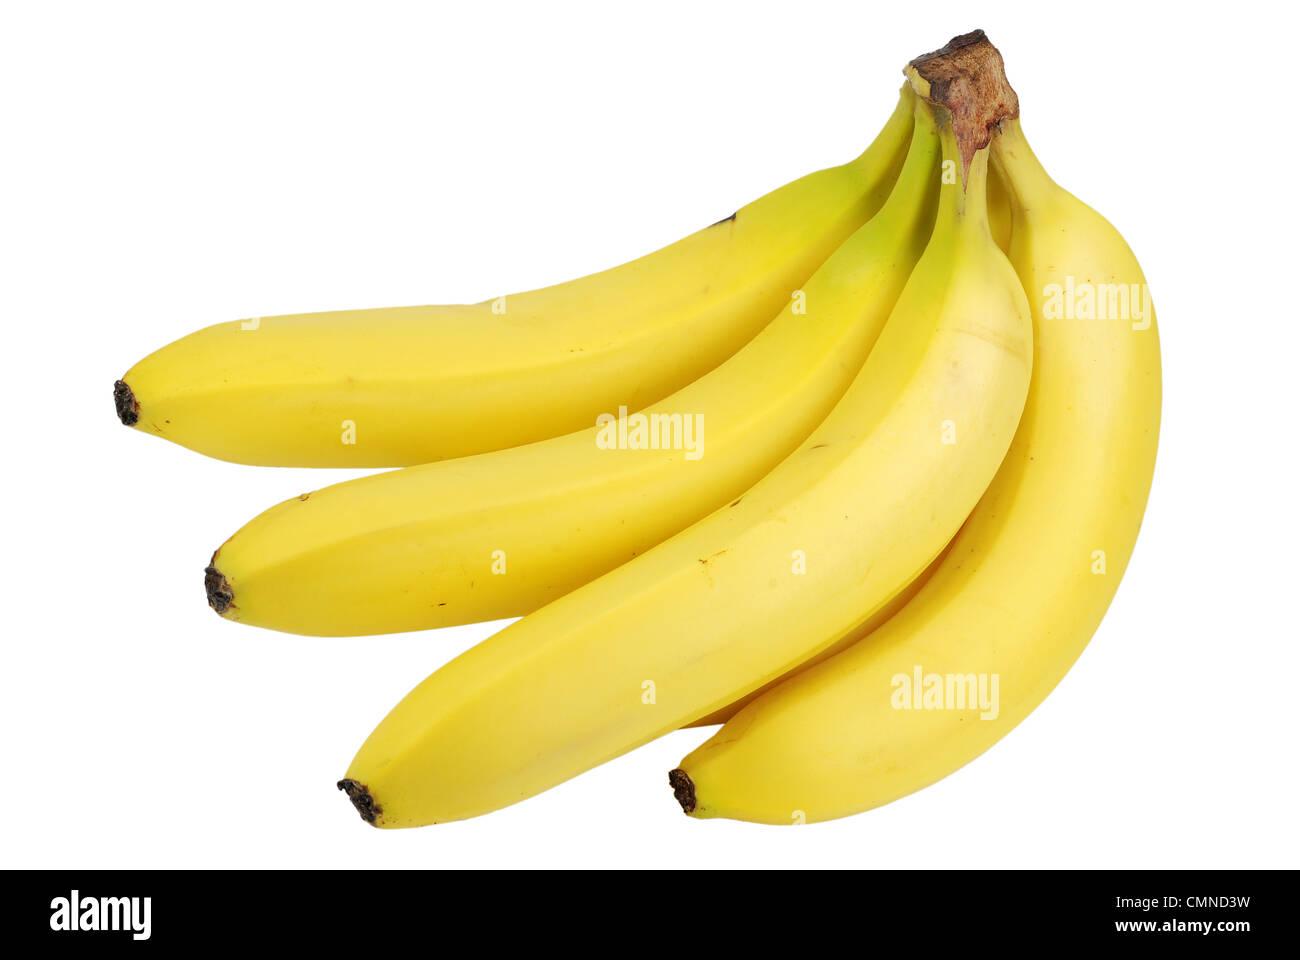 Isolated banana - Stock Image